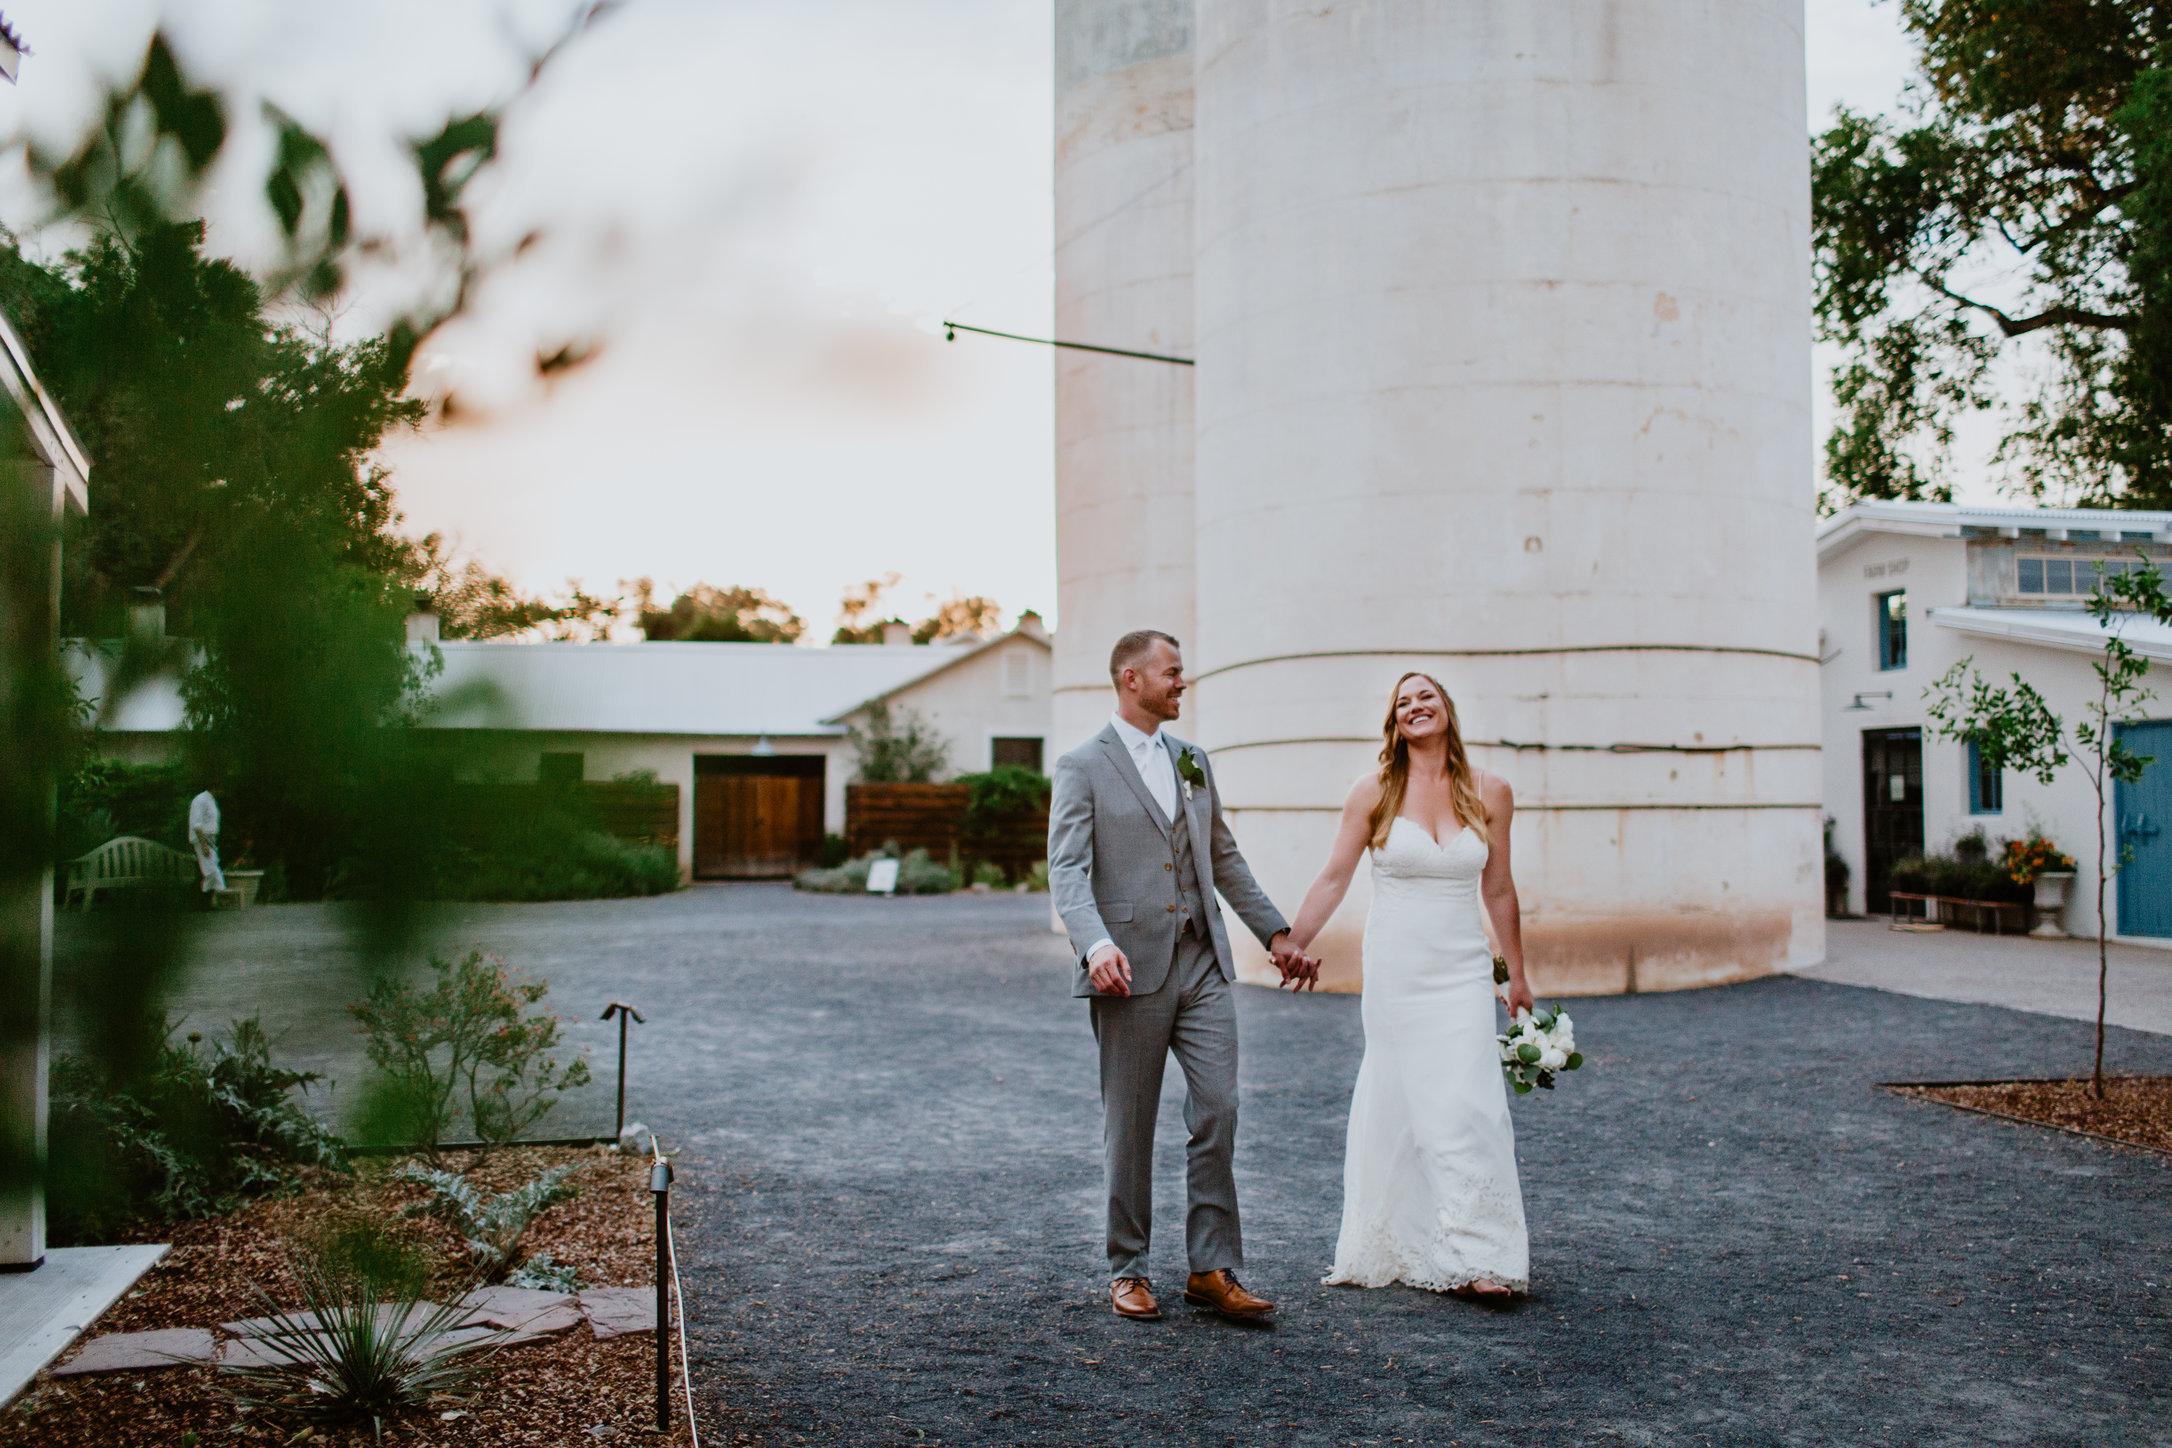 DandA-wedding-756.jpg